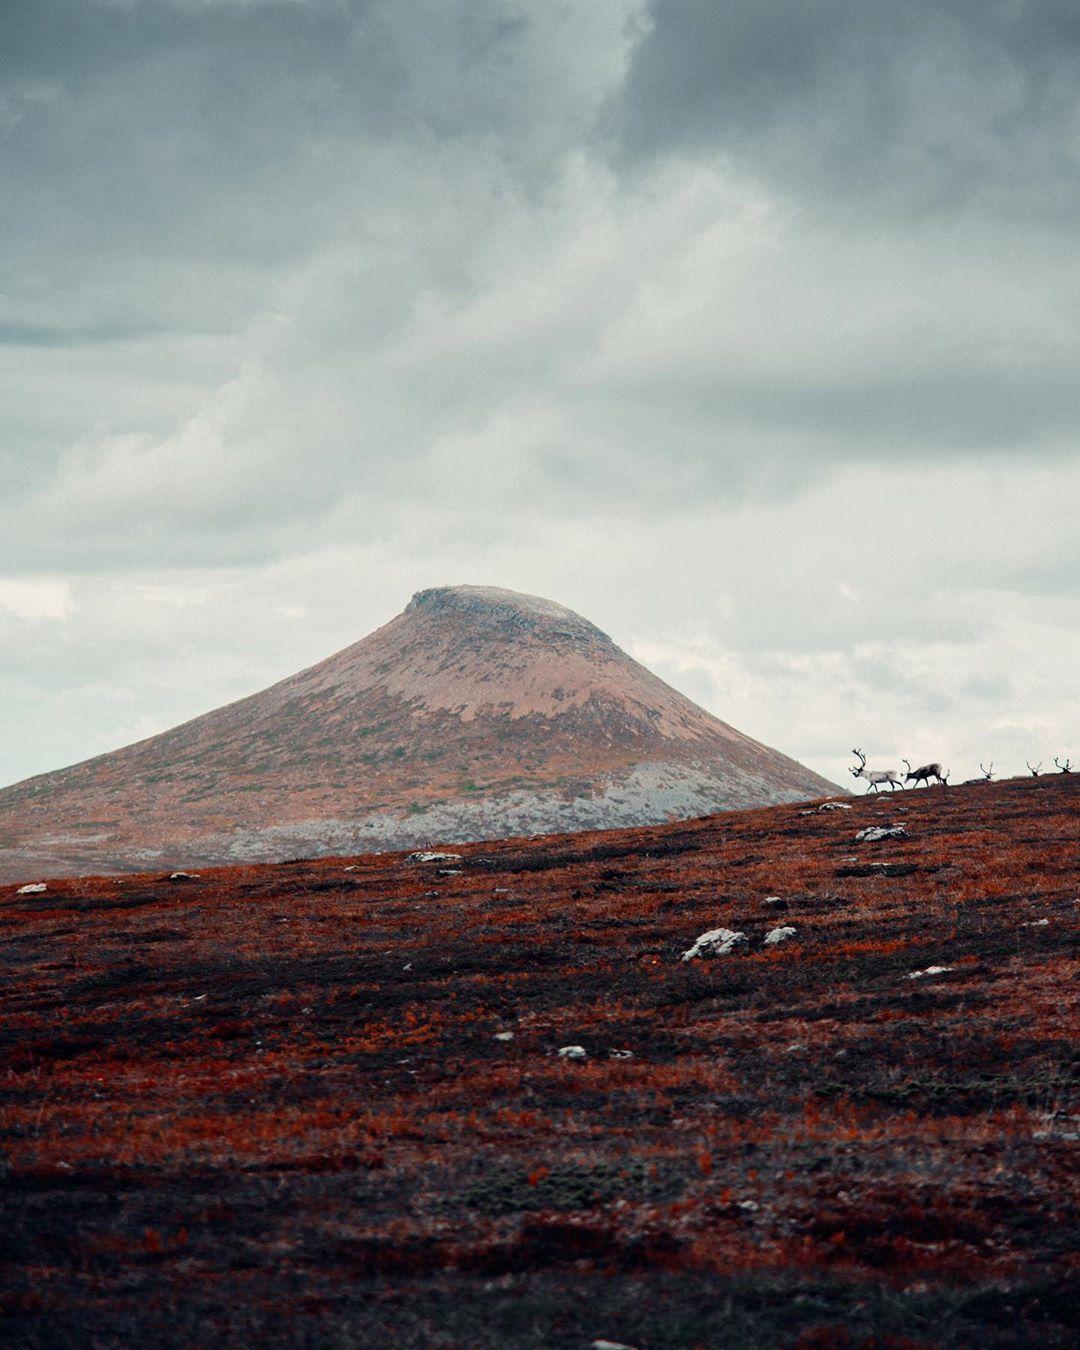 Природа и путешествия на снимках Маркуса Магнберга